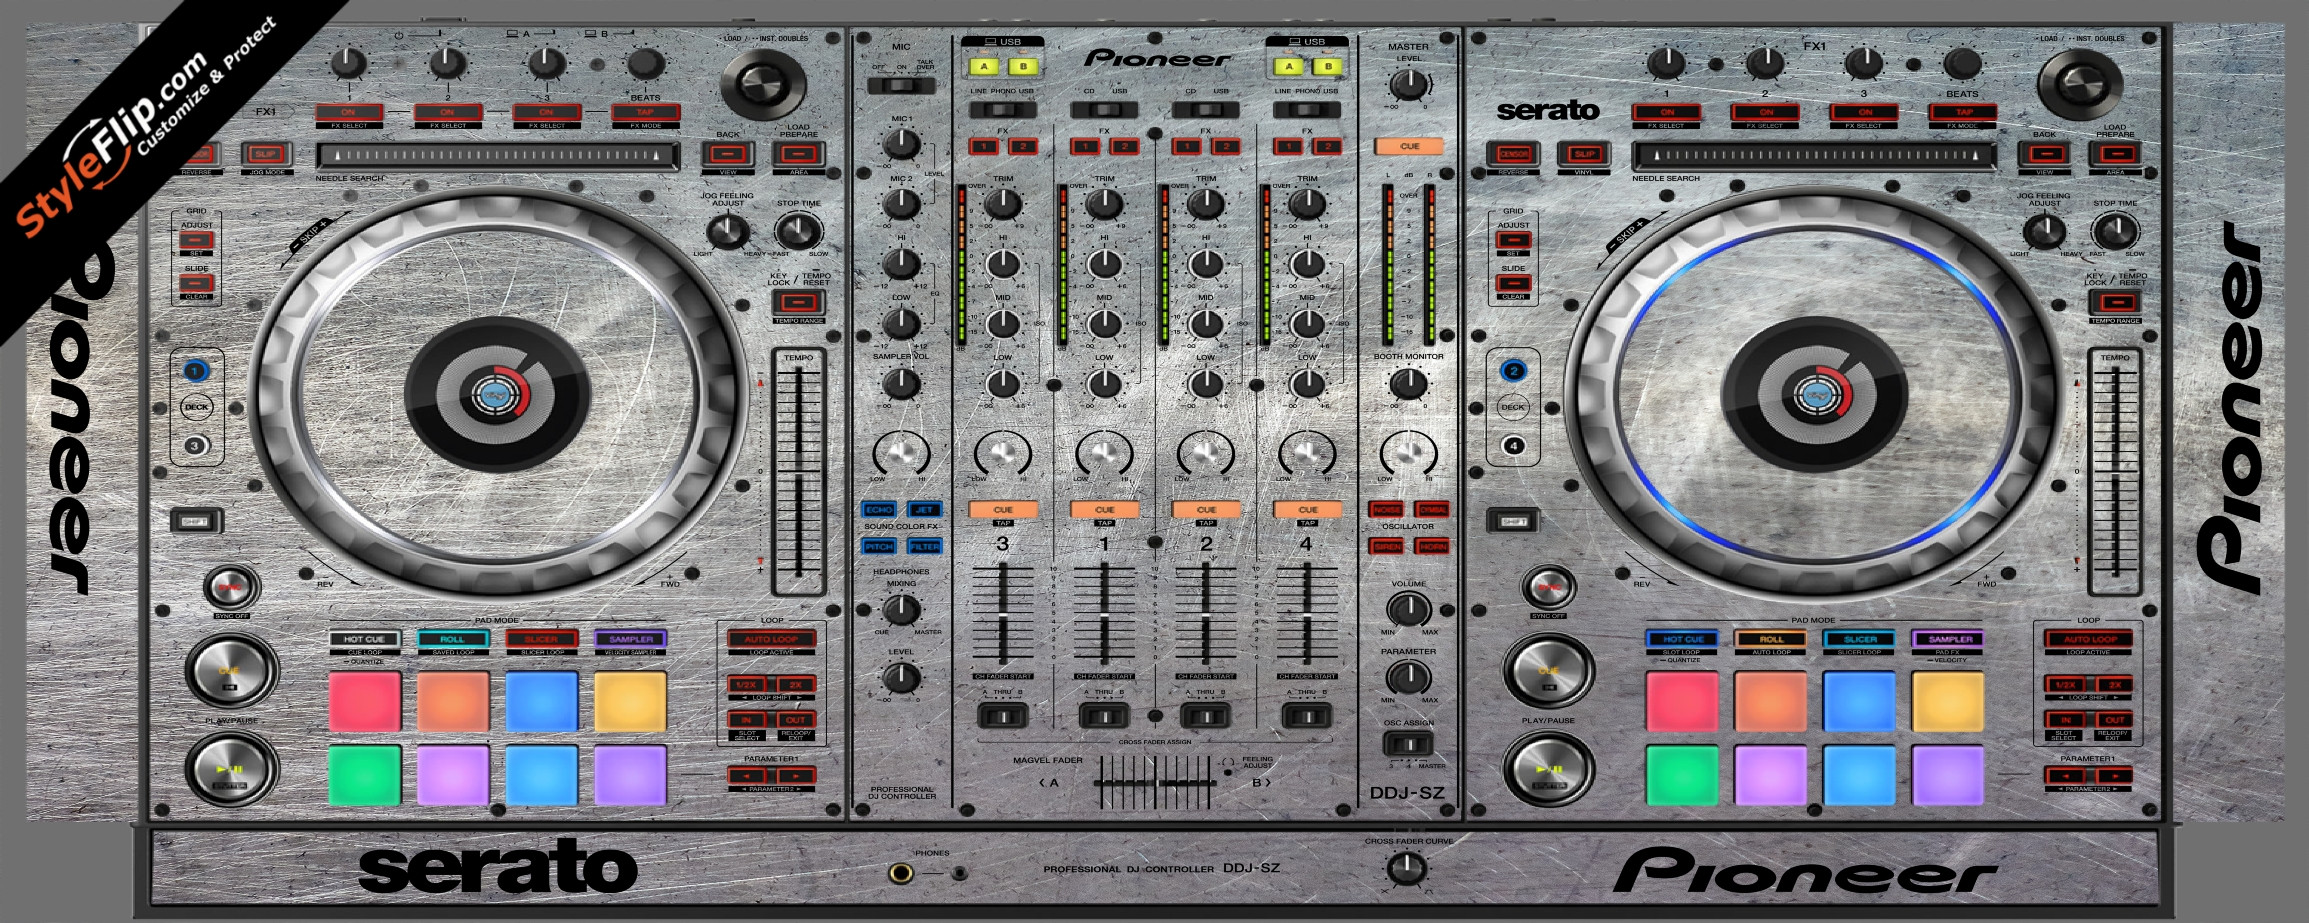 Hardware  Pioneer DDJ-SZ